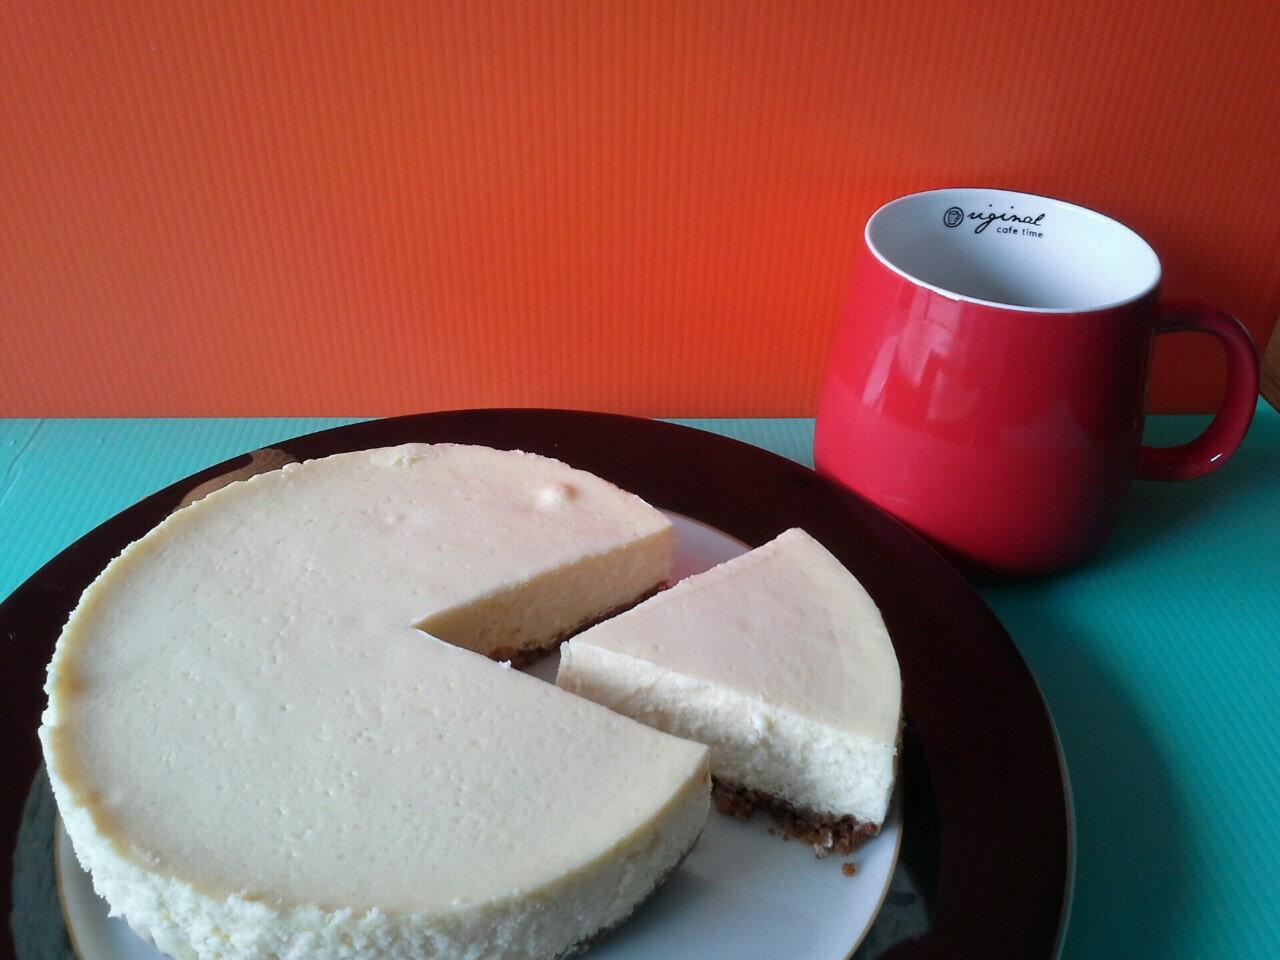 ~Honeys ~重乳酪No4原味起士蛋糕 ^(6吋^) 香濃乳酪在夏日裡化成綿密冰淇淋口